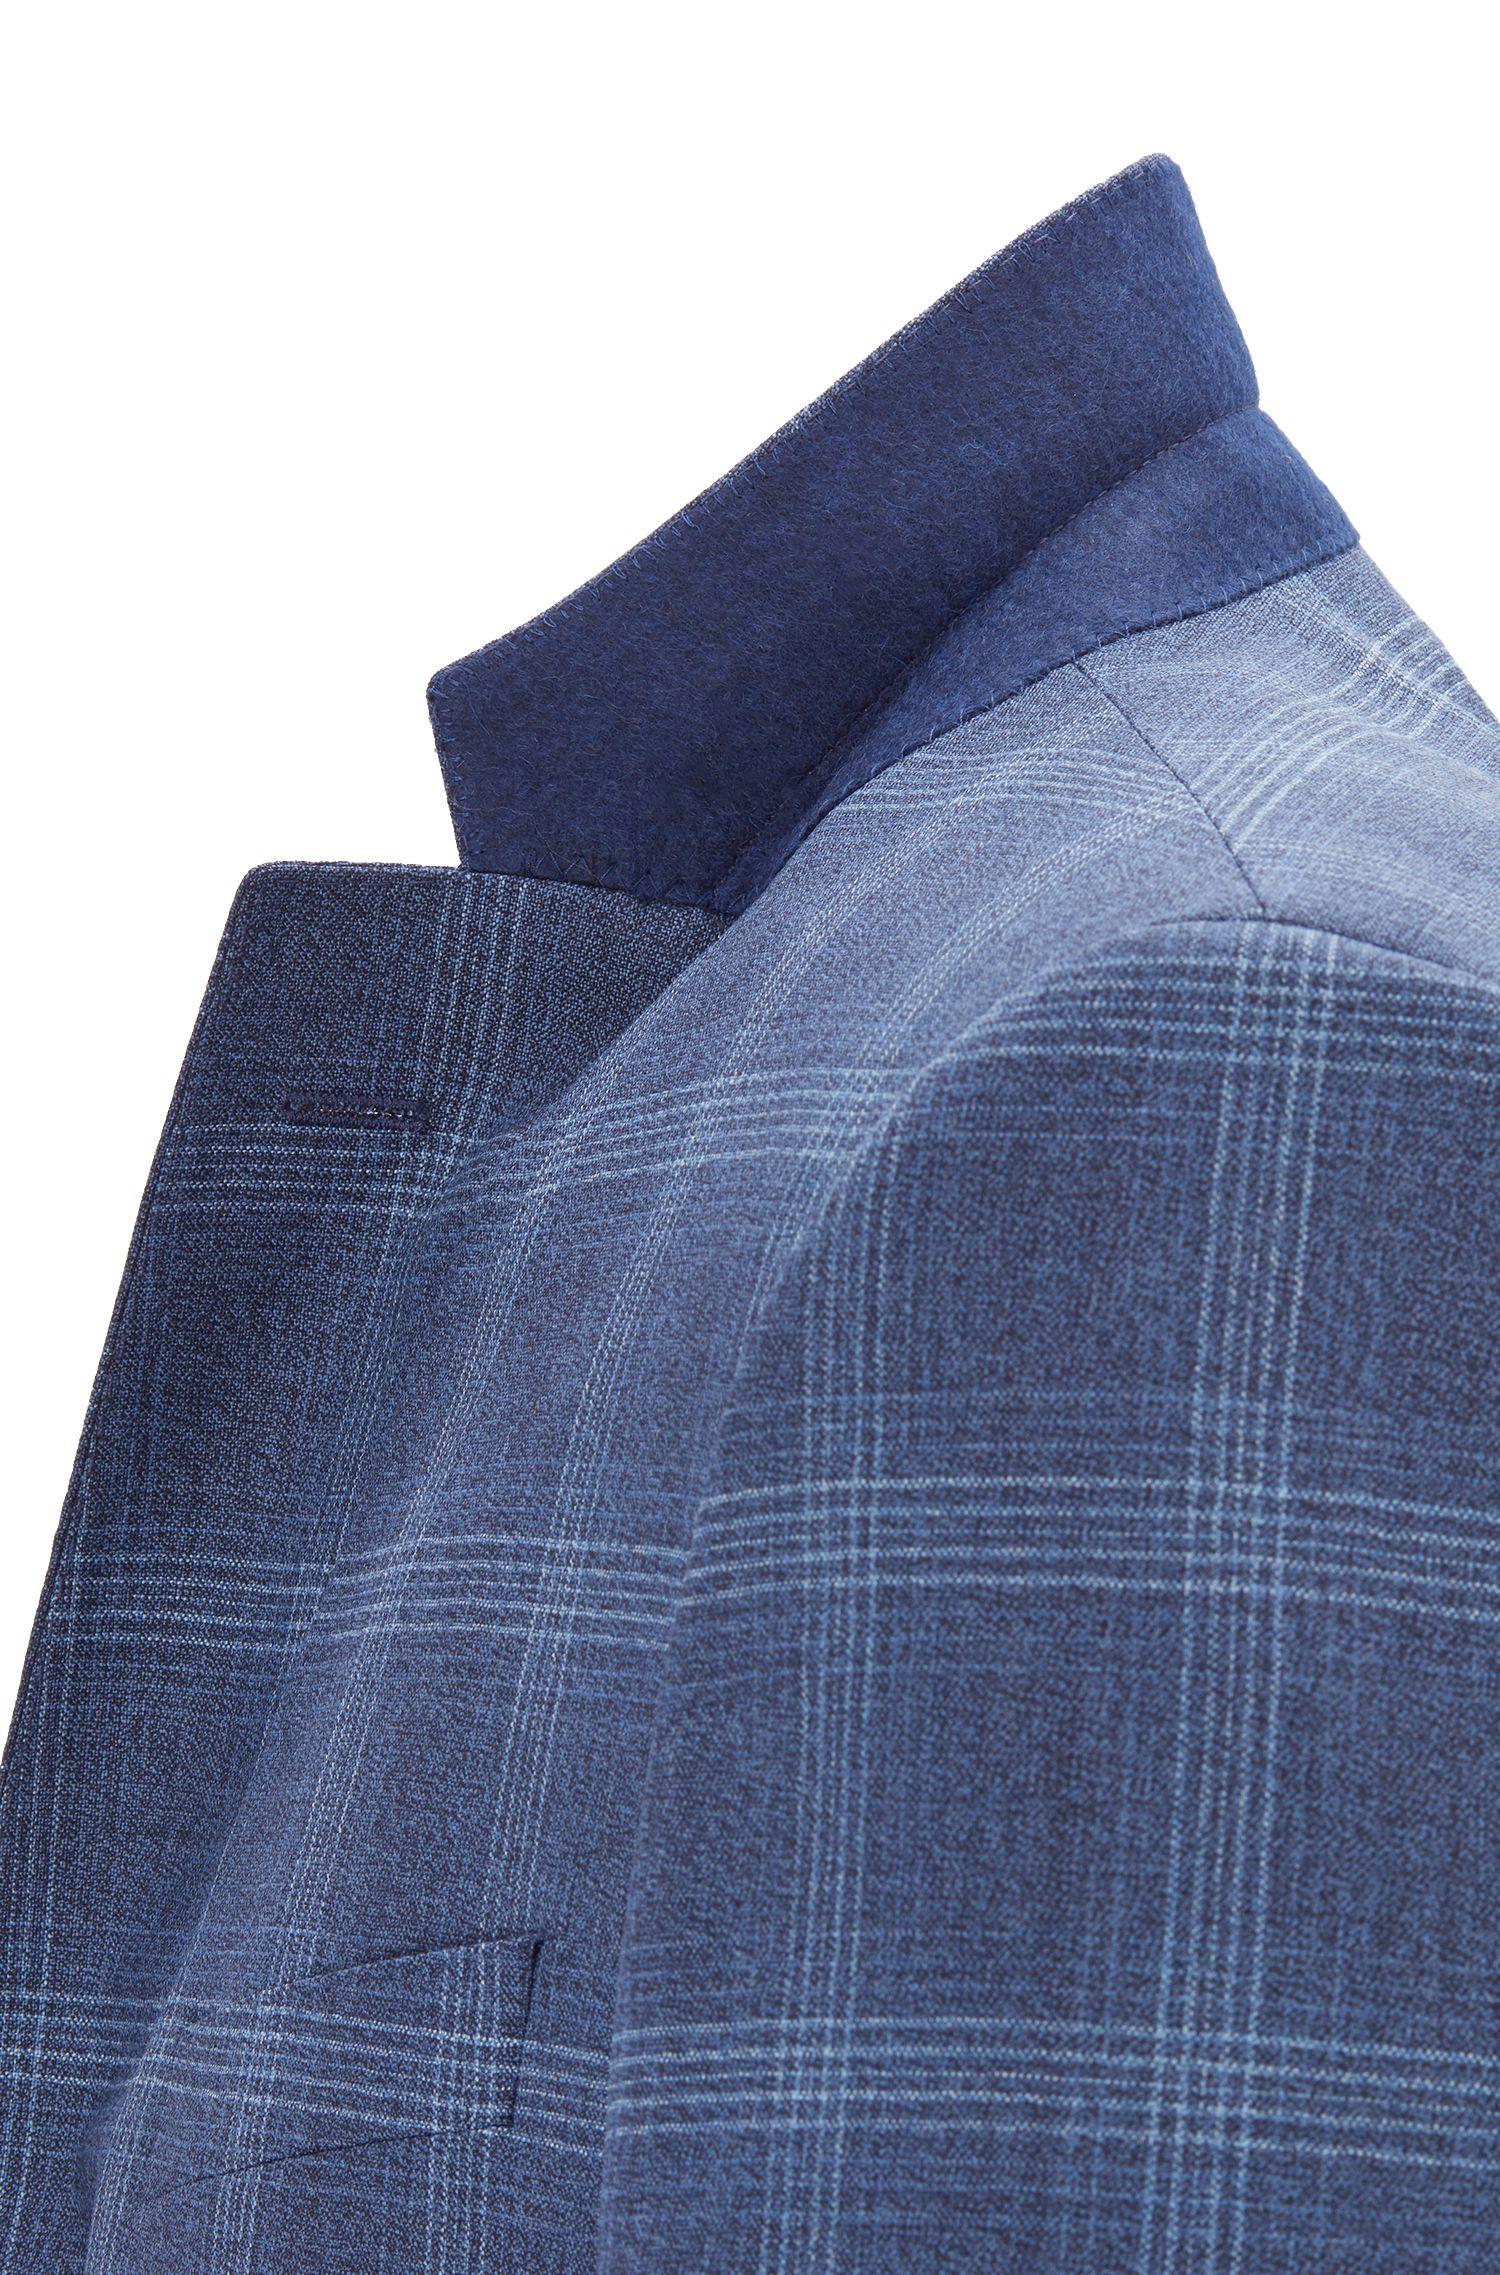 Slim-fit suit in checkered virgin wool, Open Blue